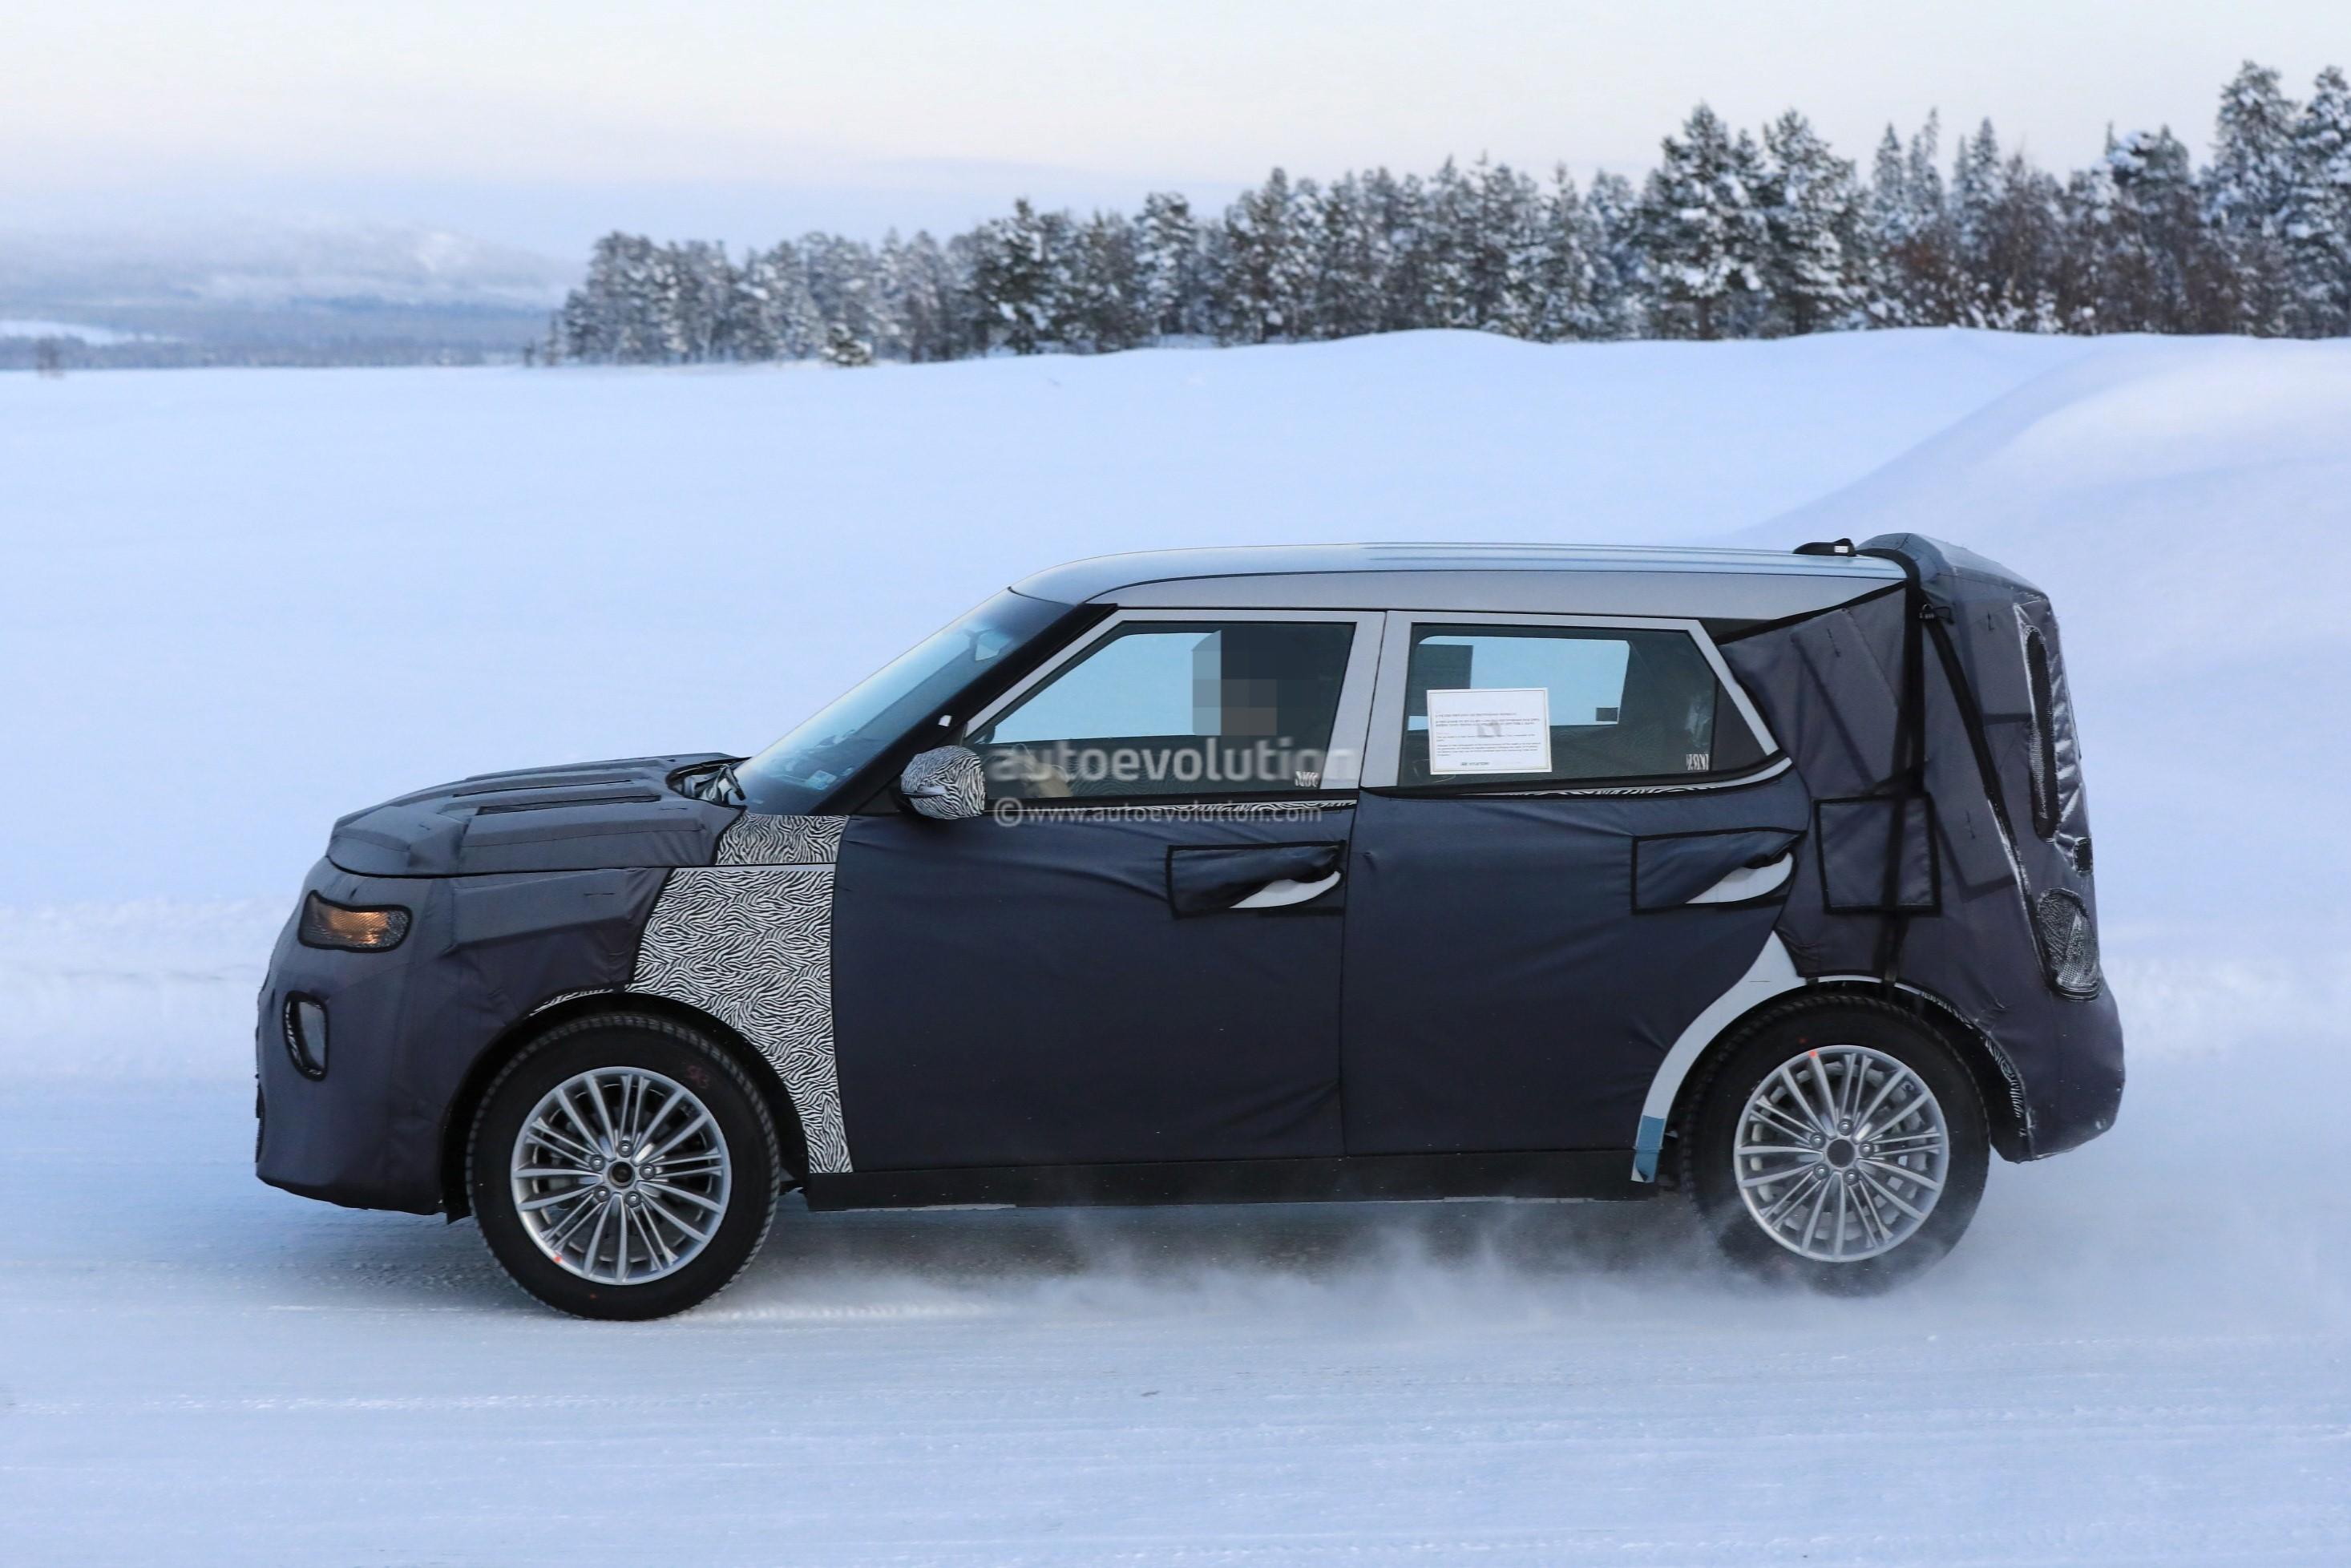 2020 Kia Soul EV To Platform With Hyundai Kona Electric